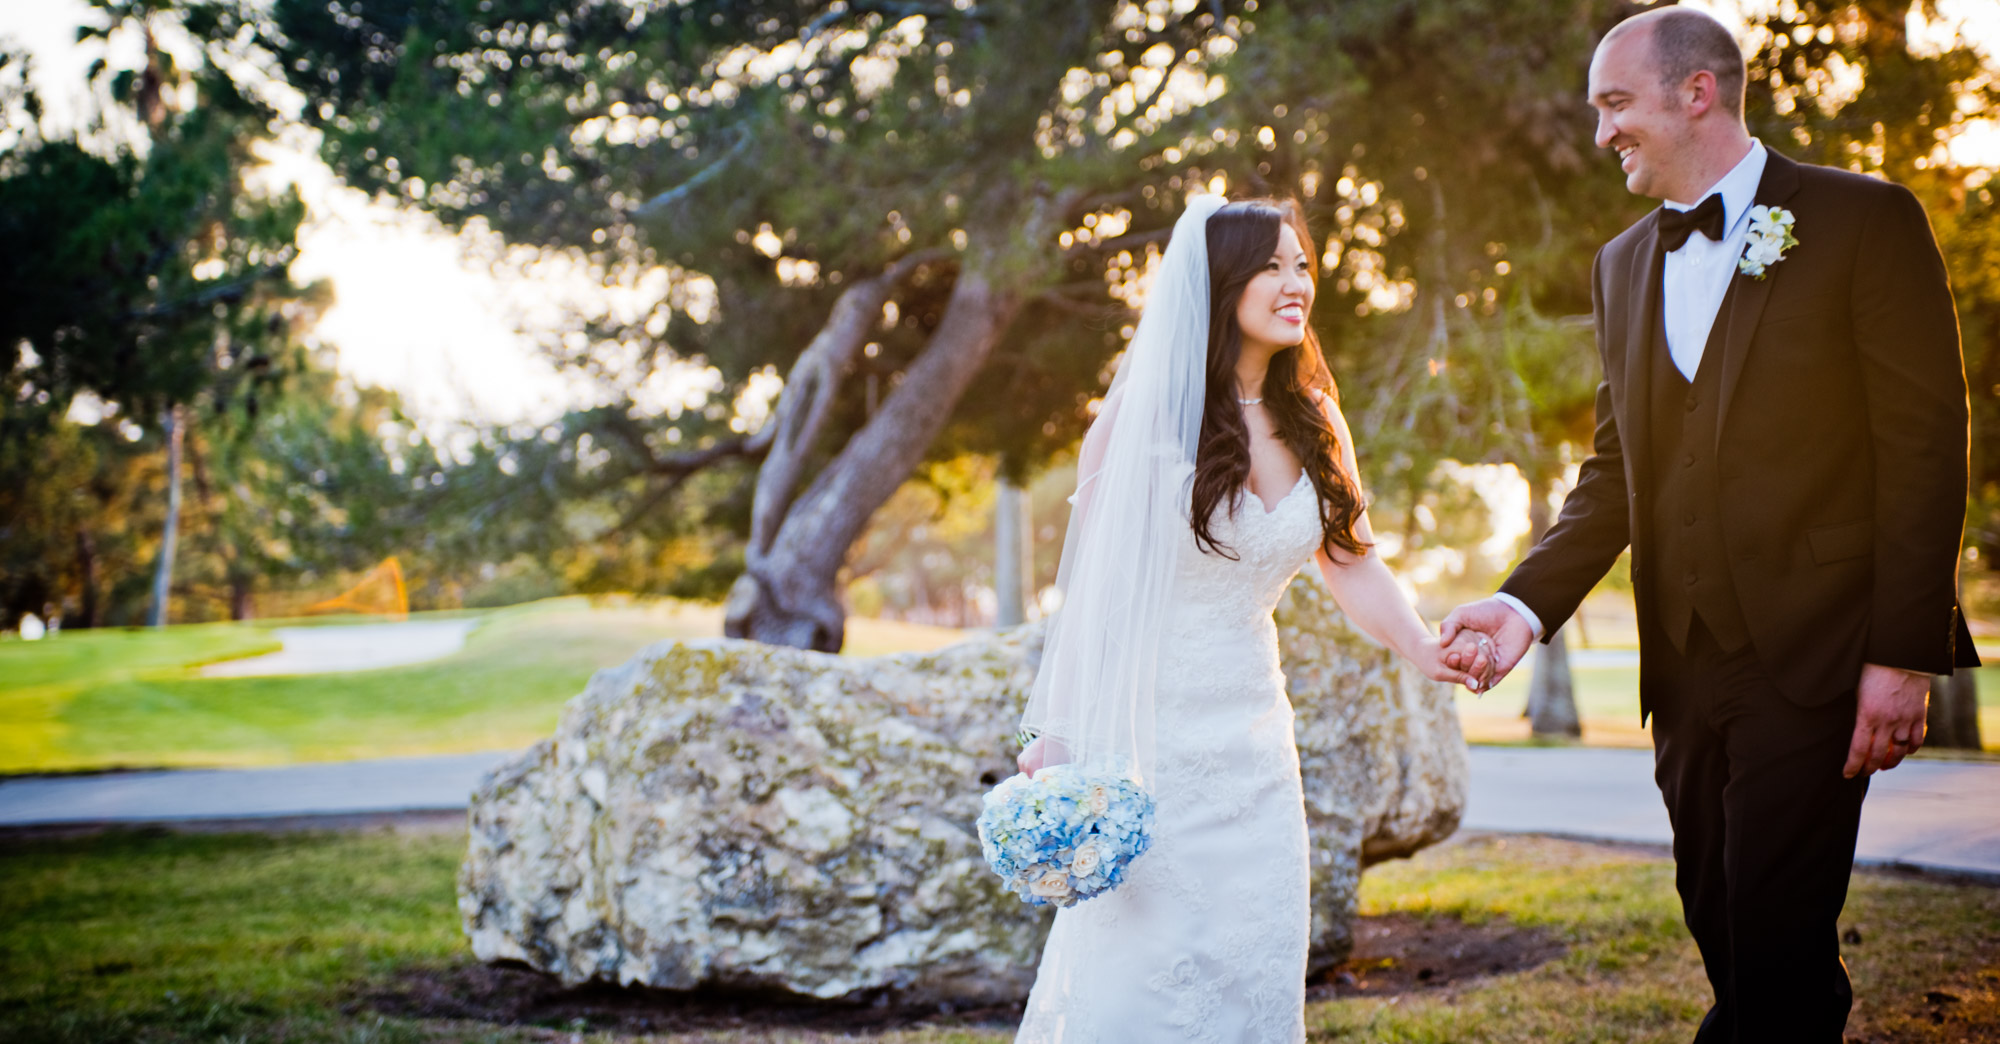 Liza & Steve's Palos Verdes Country Club Wedding featured slider image